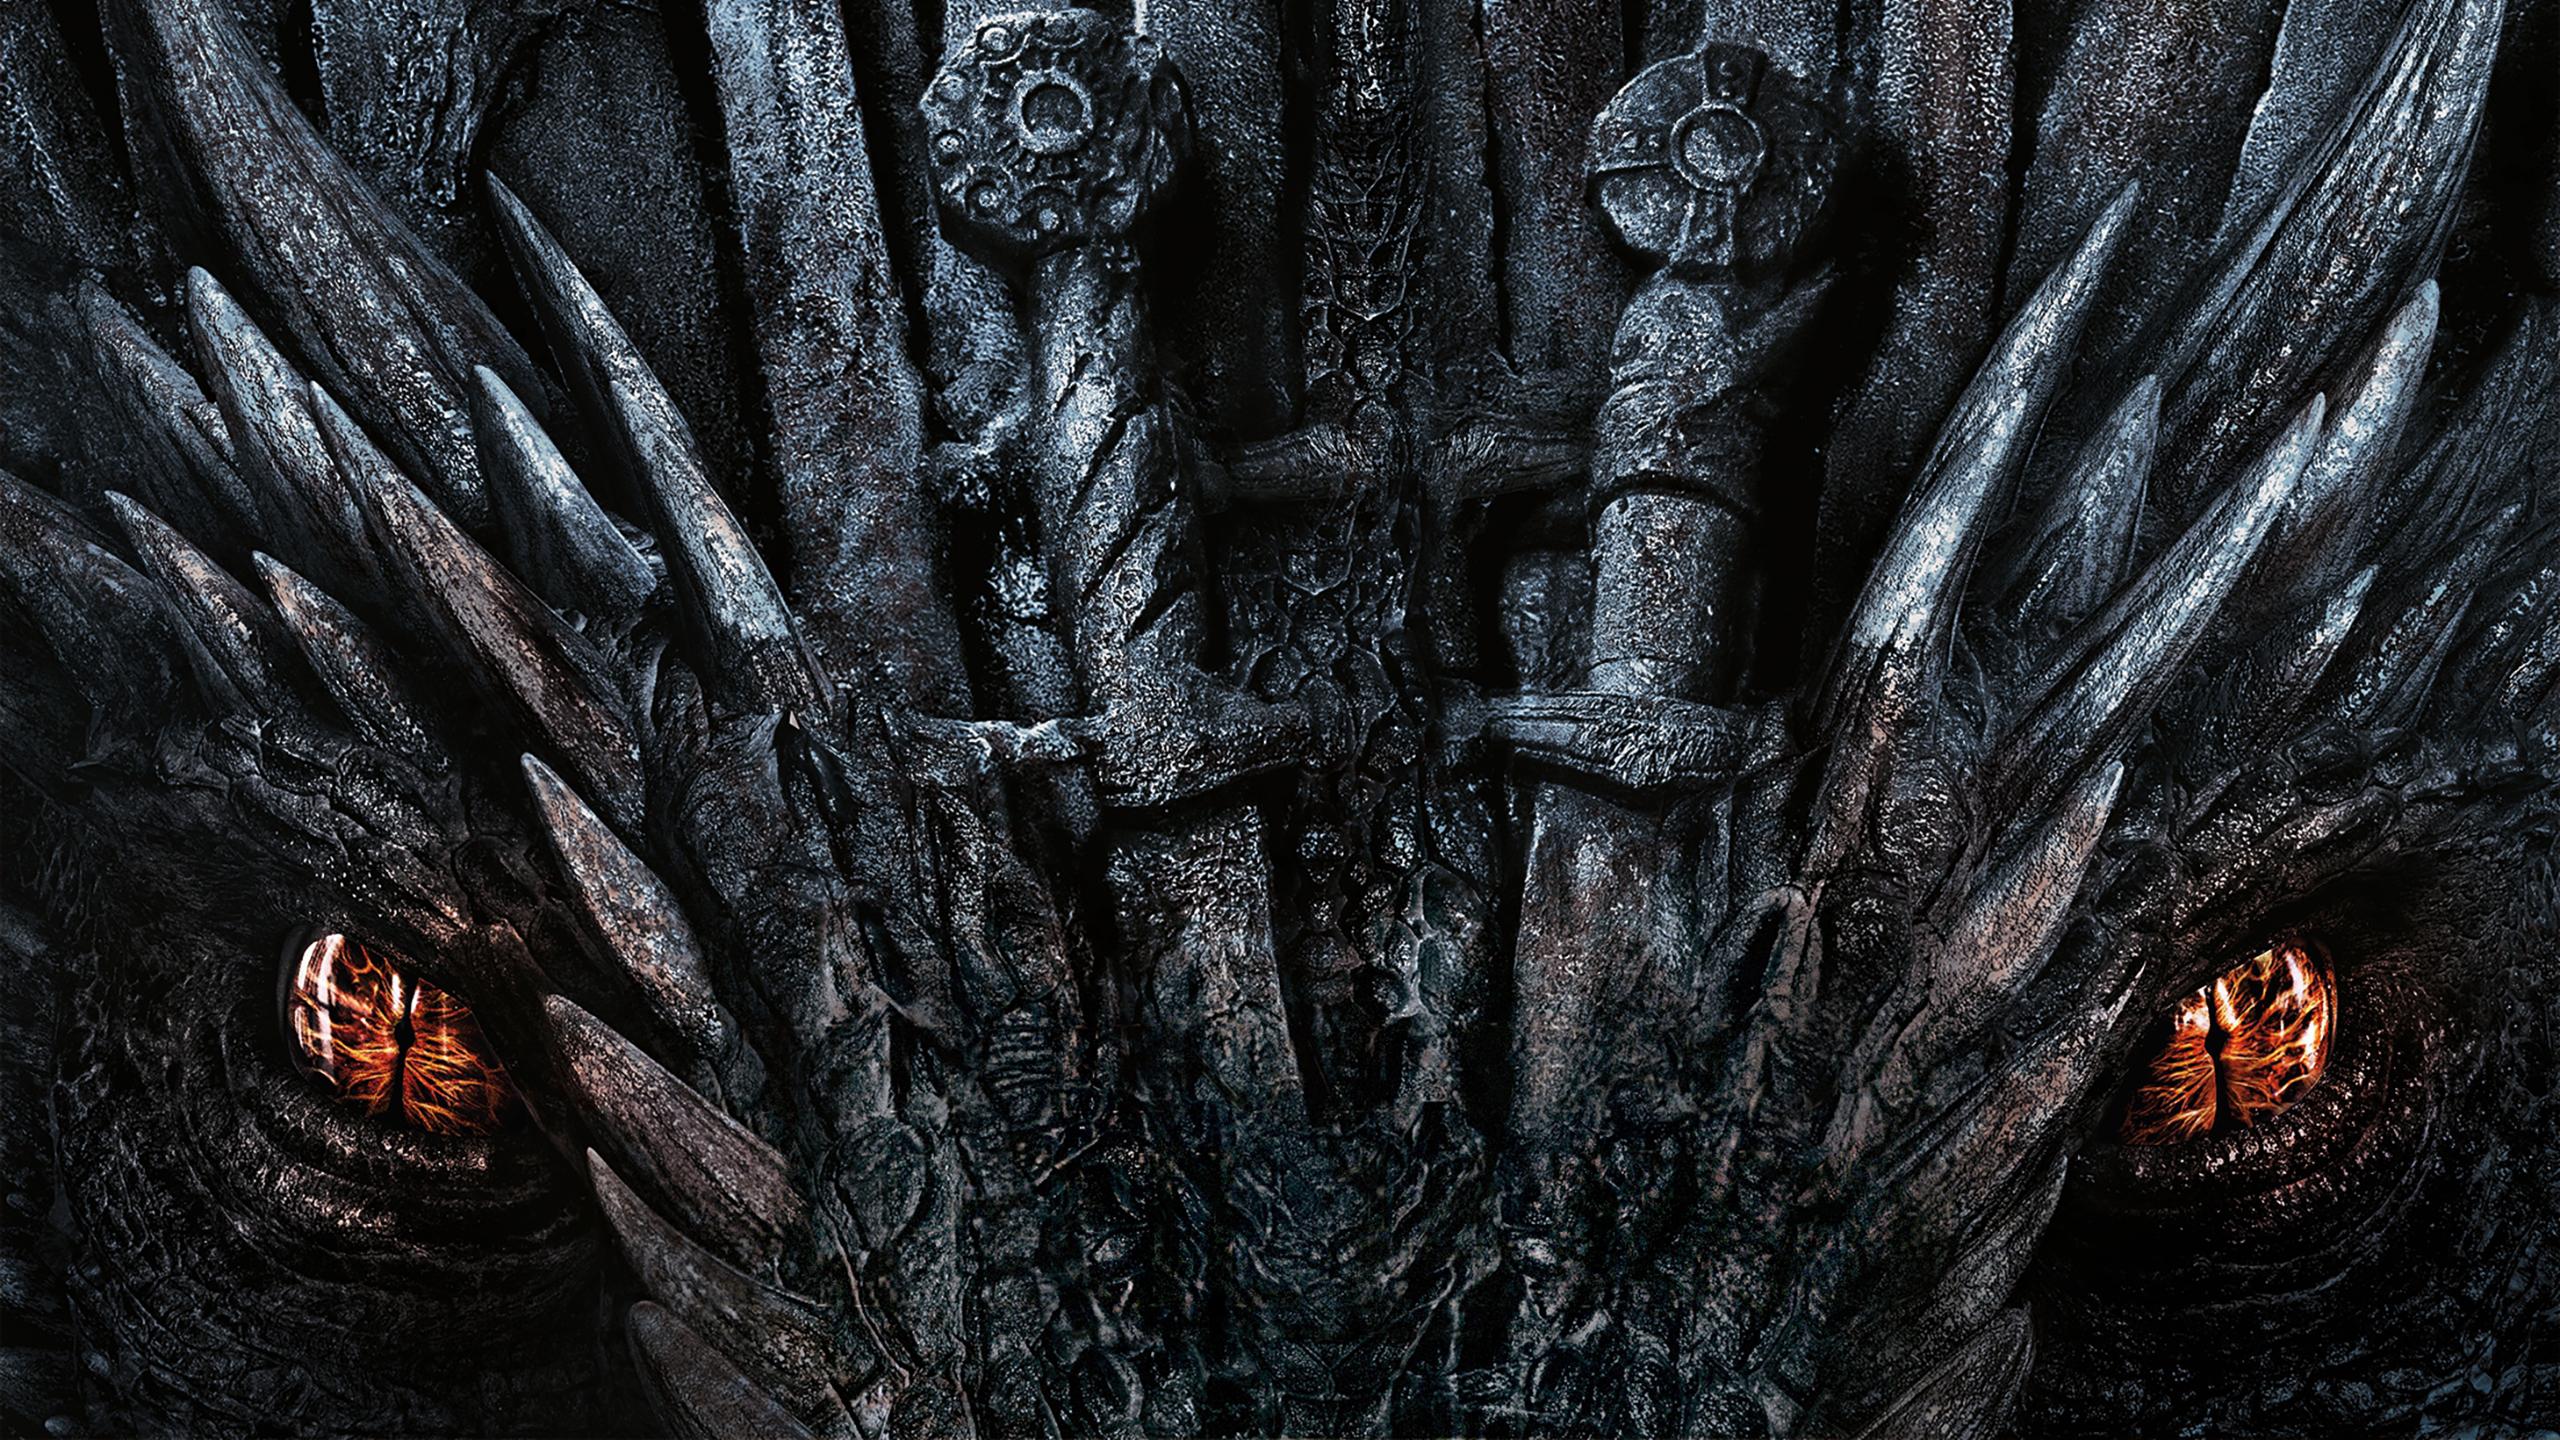 Game Of Thrones Season 8 Drogon - HD Wallpaper